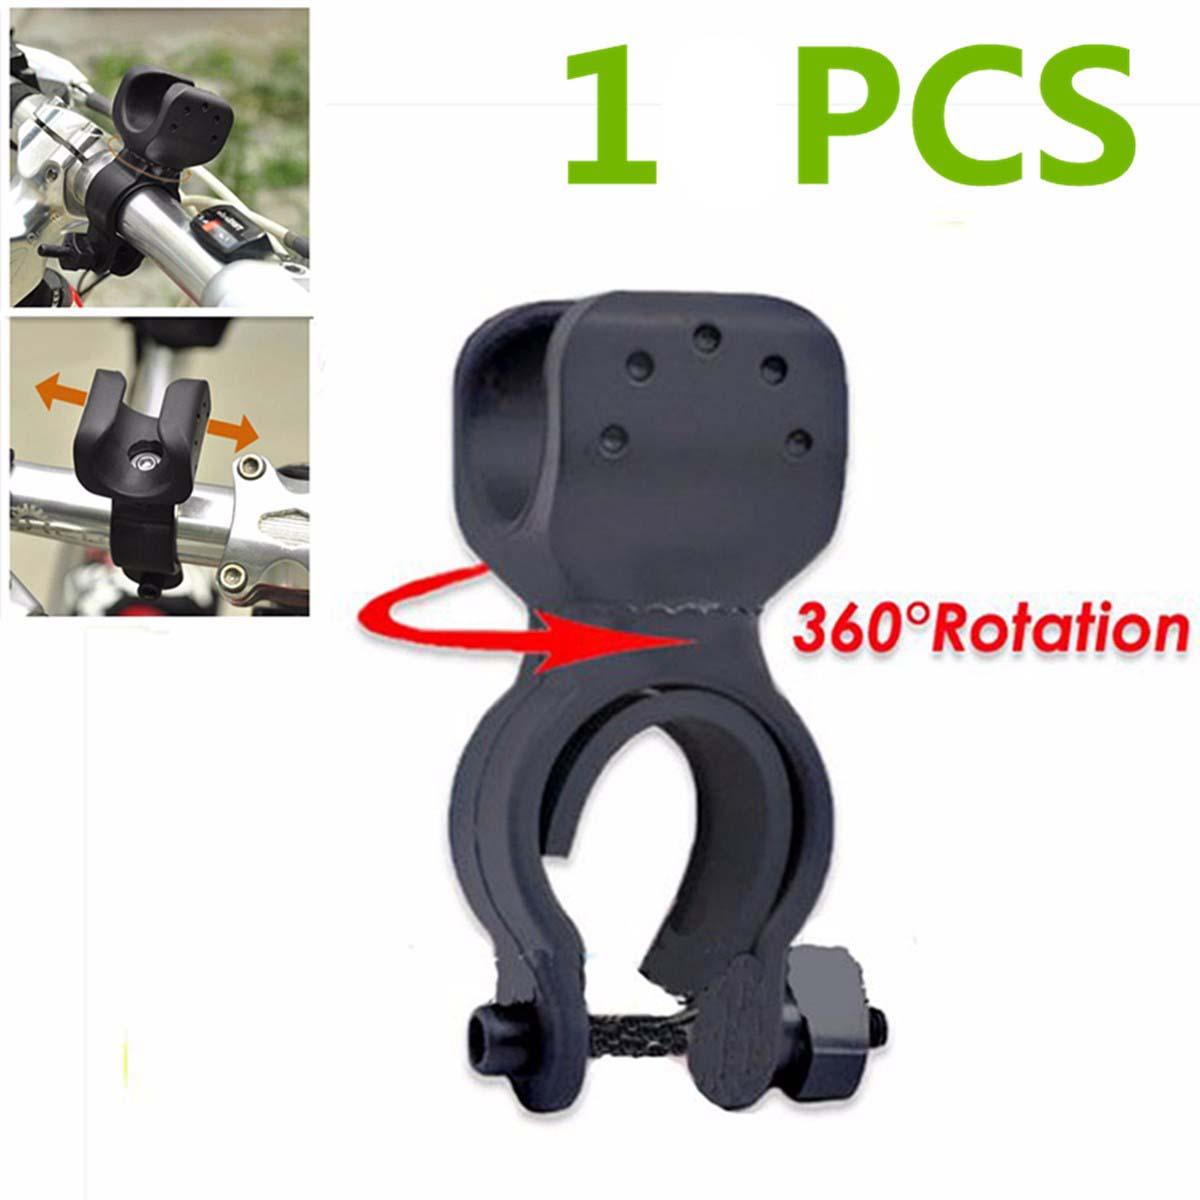 20,5 cm negro bicicleta linterna para bicicleta LED antorcha soporte montaje Clip con correa adhesiva